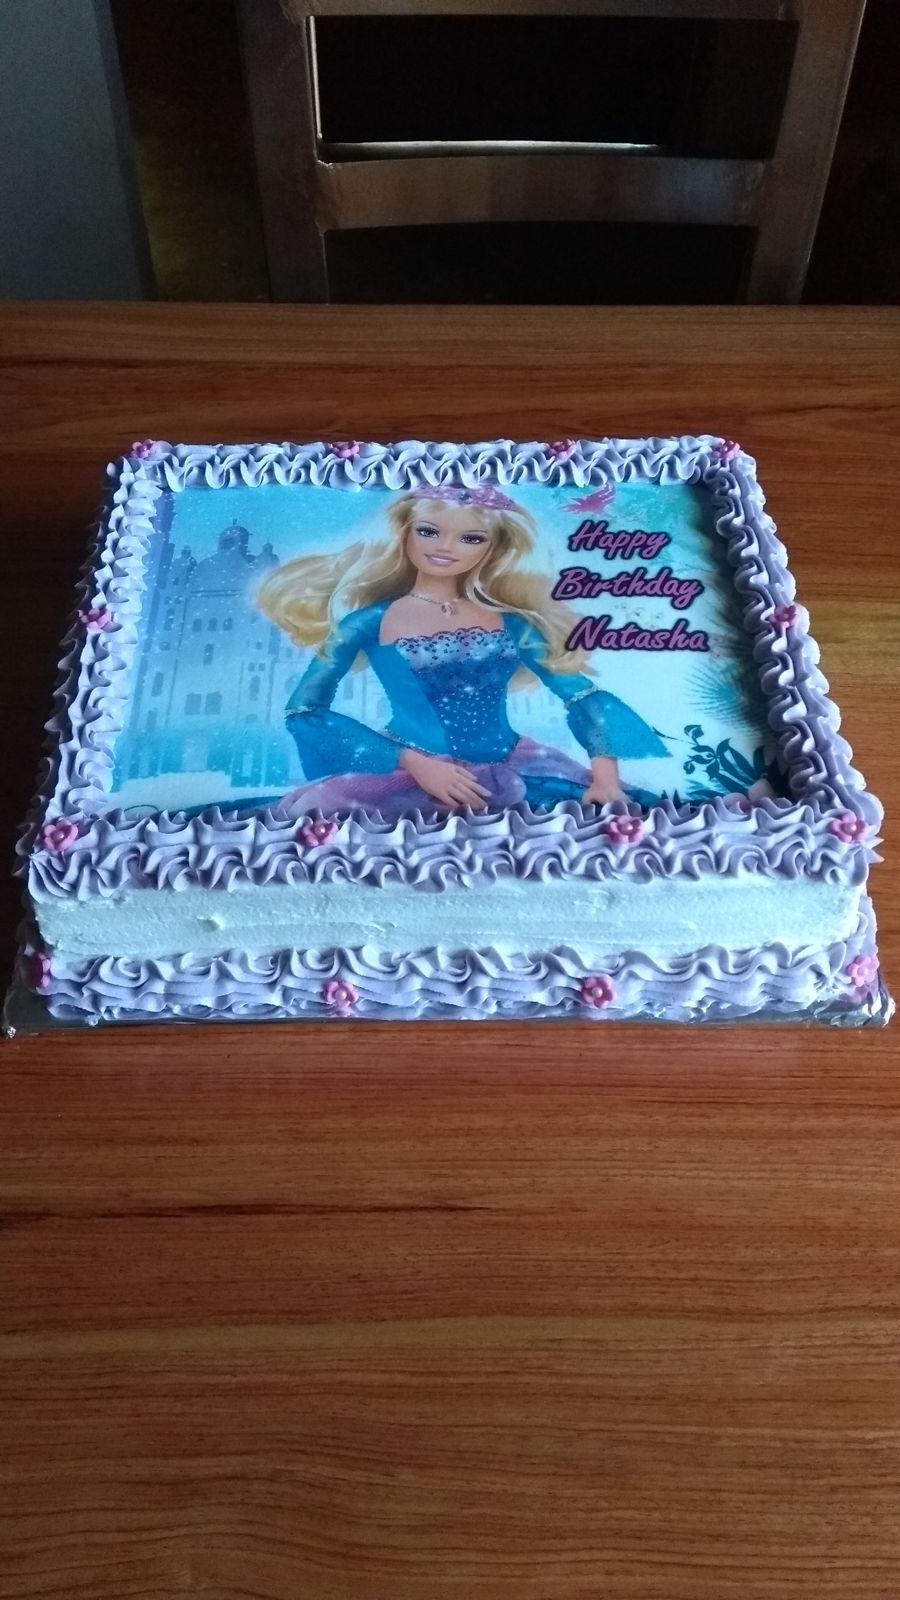 Pleasing Birthday Cake Girl Cakecentral Com Funny Birthday Cards Online Barepcheapnameinfo